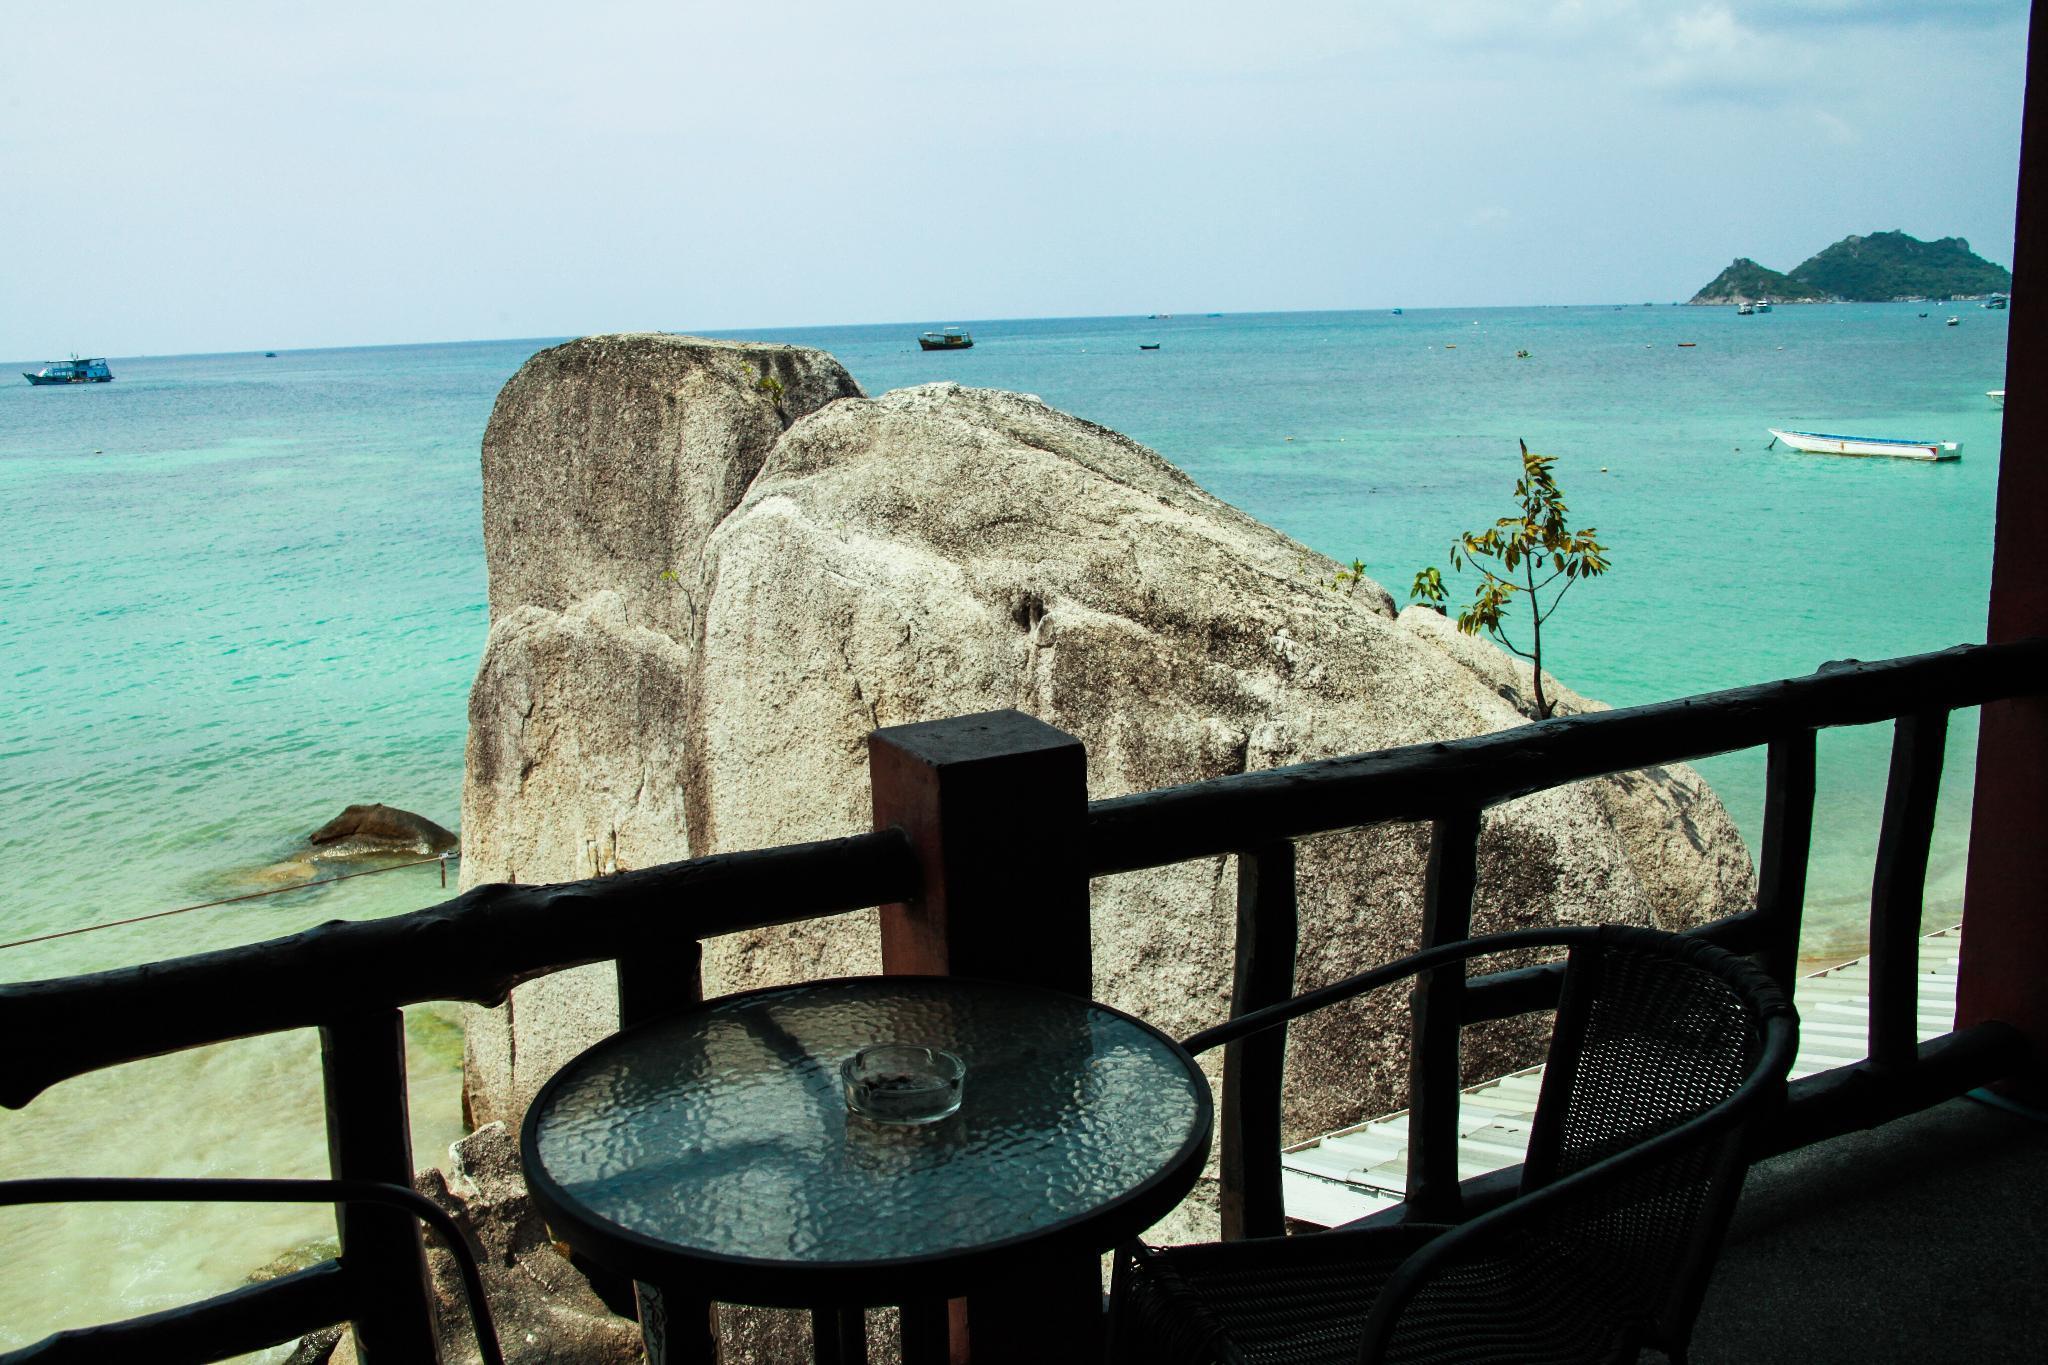 koh tao my hostel Sea view room  C1 บ้านเดี่ยว 1 ห้องนอน 1 ห้องน้ำส่วนตัว ขนาด 19 ตร.ม. – หาดทรายรี